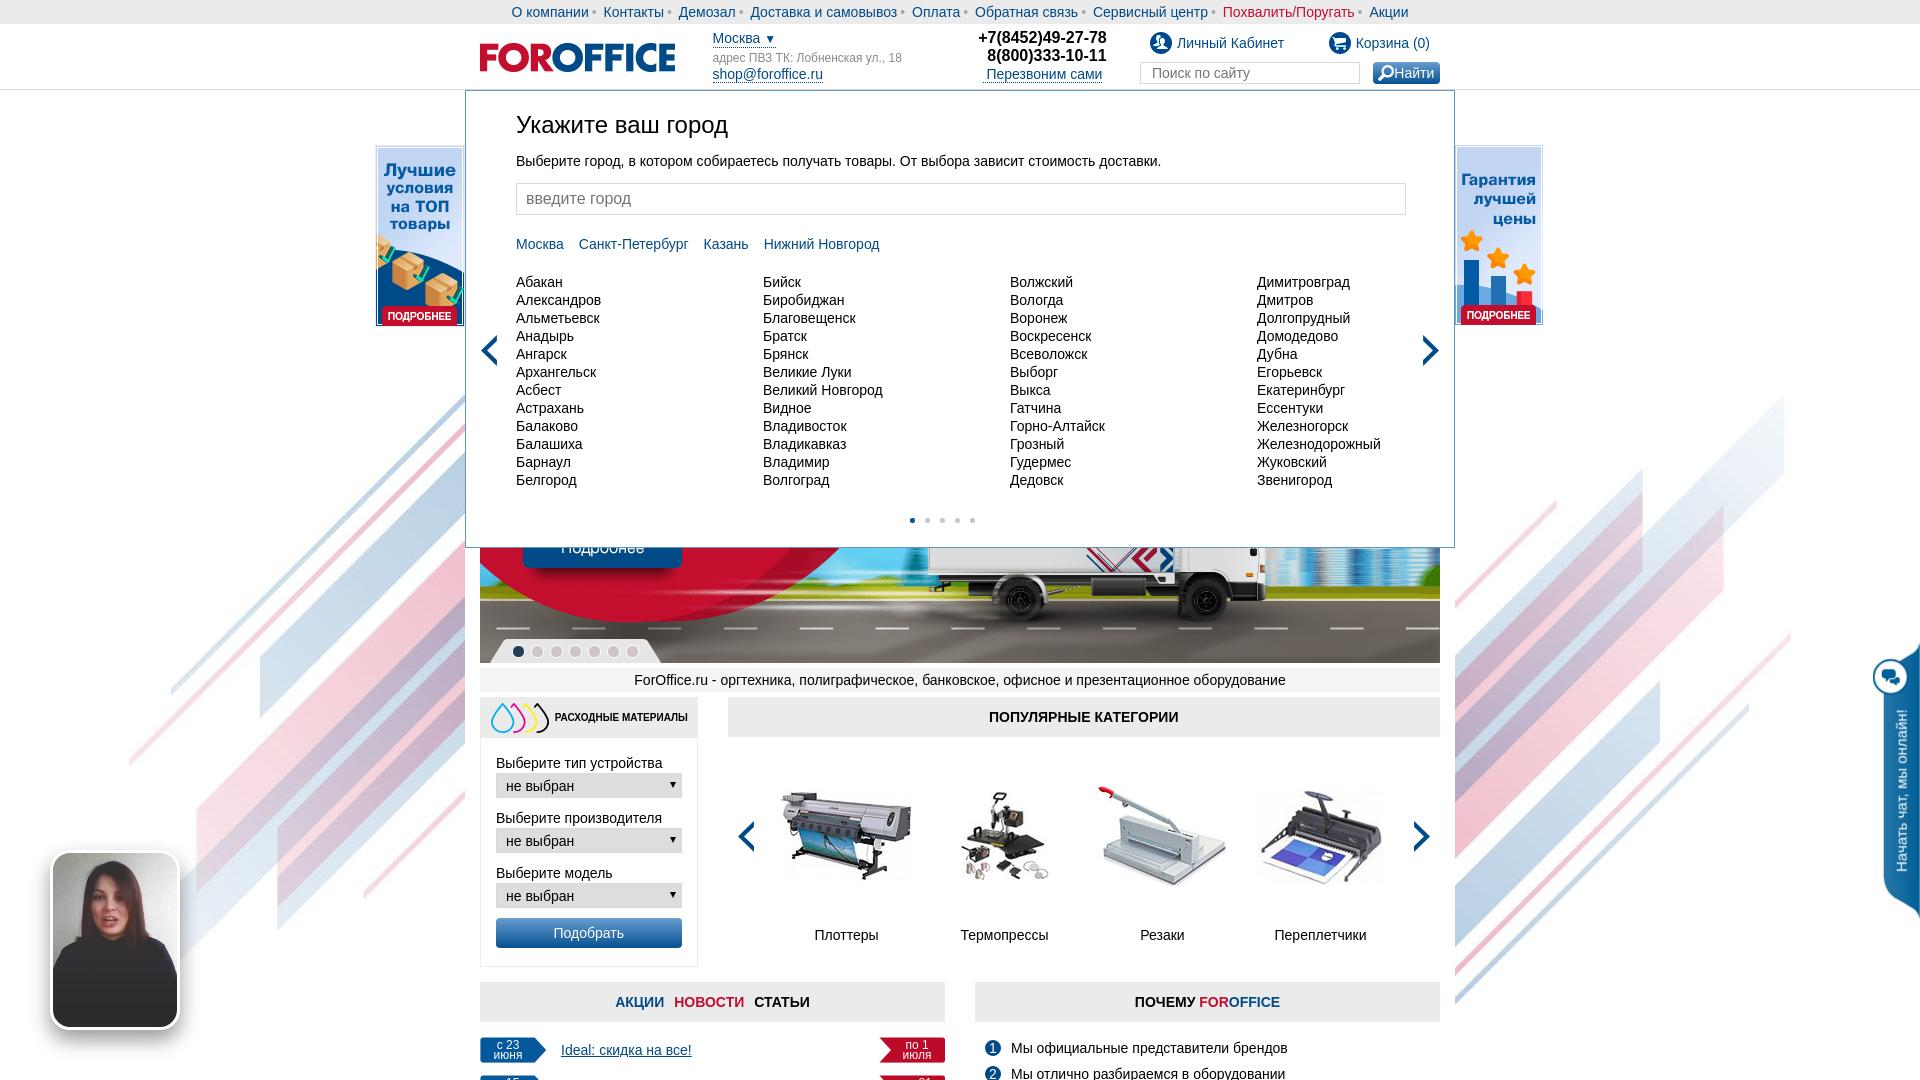 FOROFFICE website